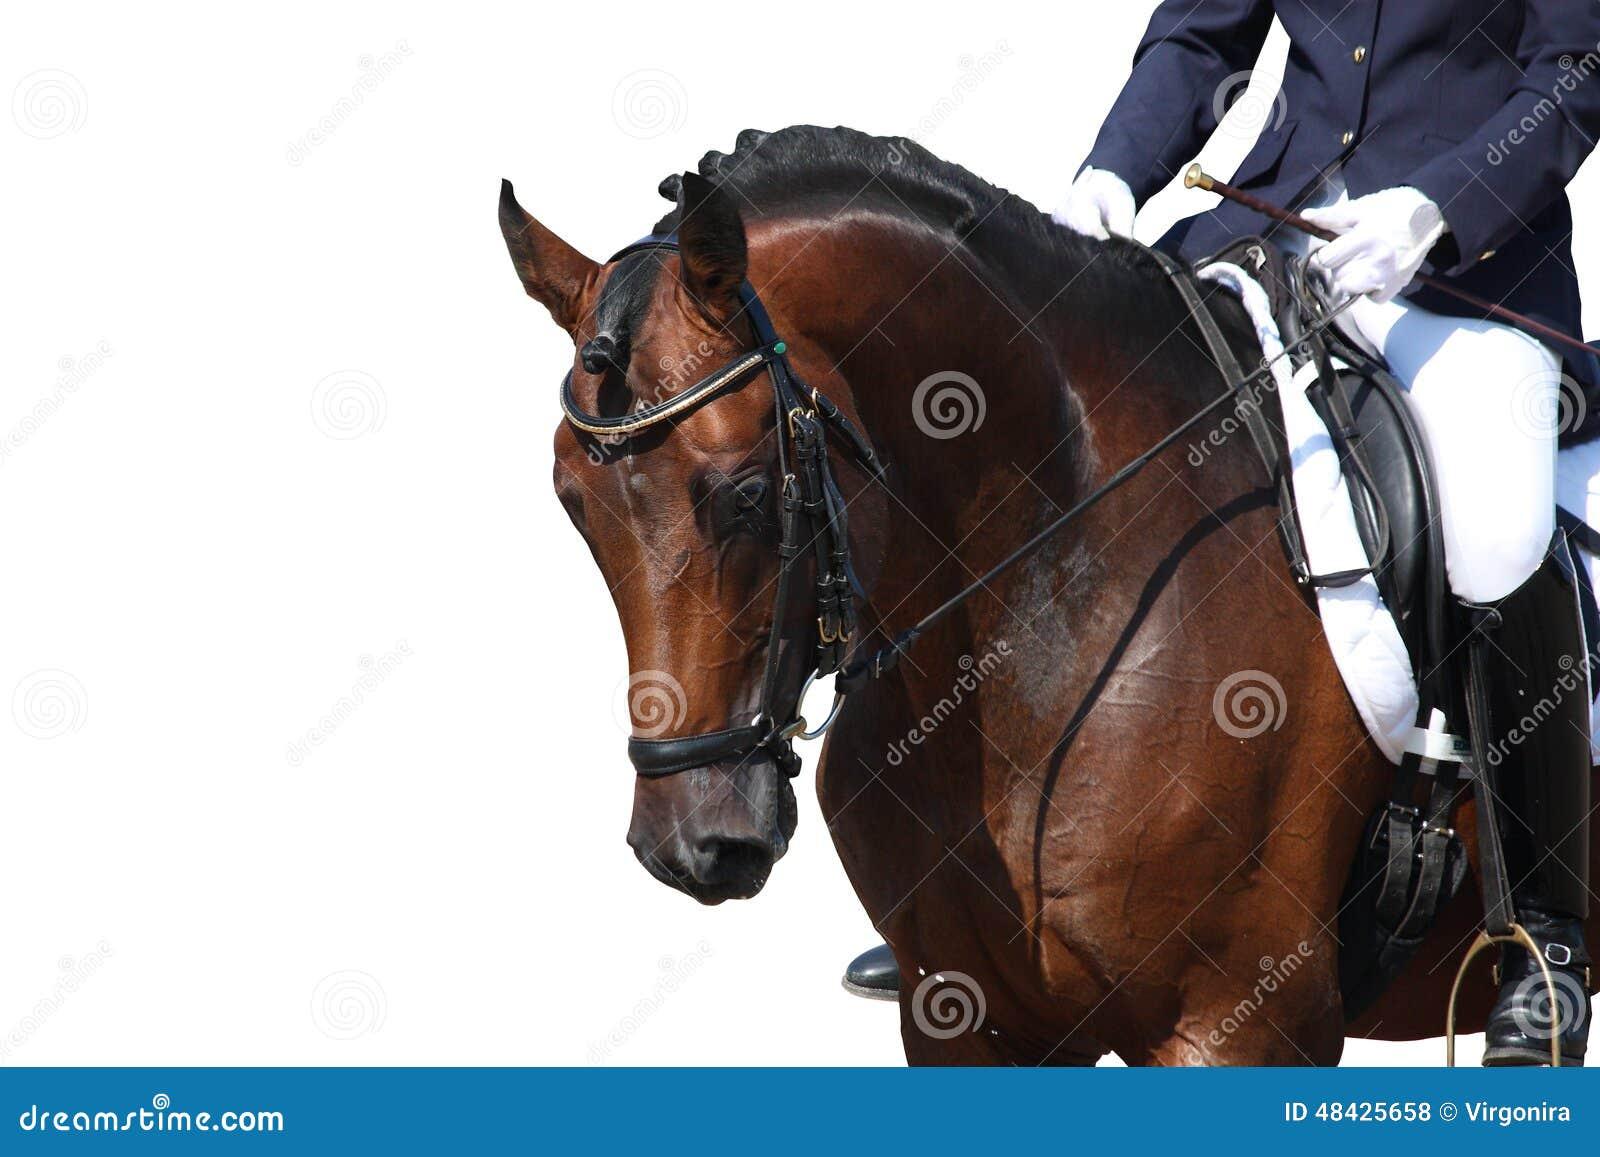 Bay horse portrait isolated on white